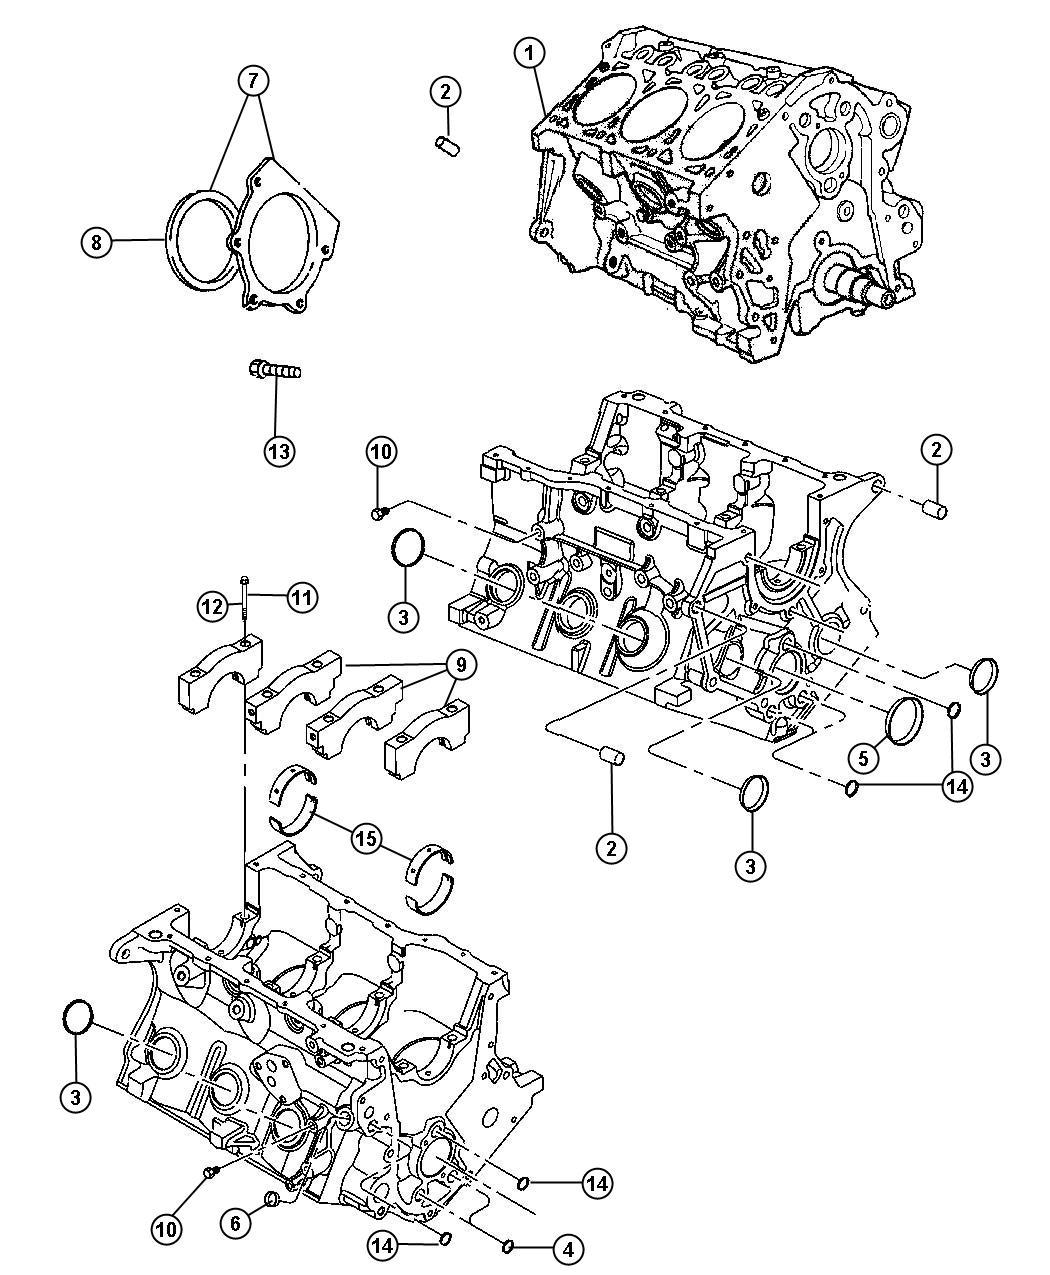 Dodge Grand Caravan Engine. Short block. New part for core